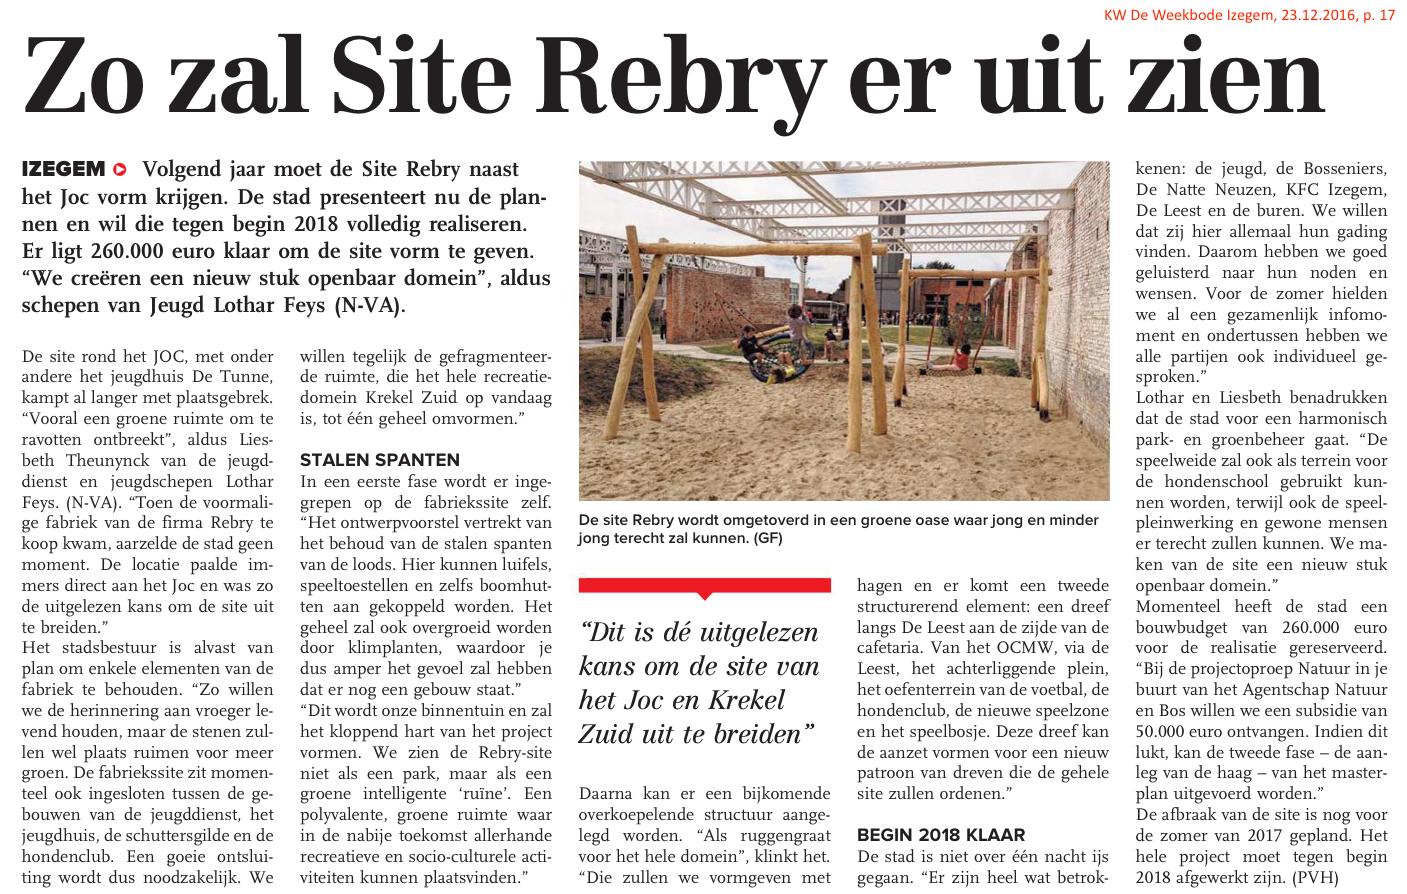 KW De Weekbode Izegem, 23.12.2016, p. 17